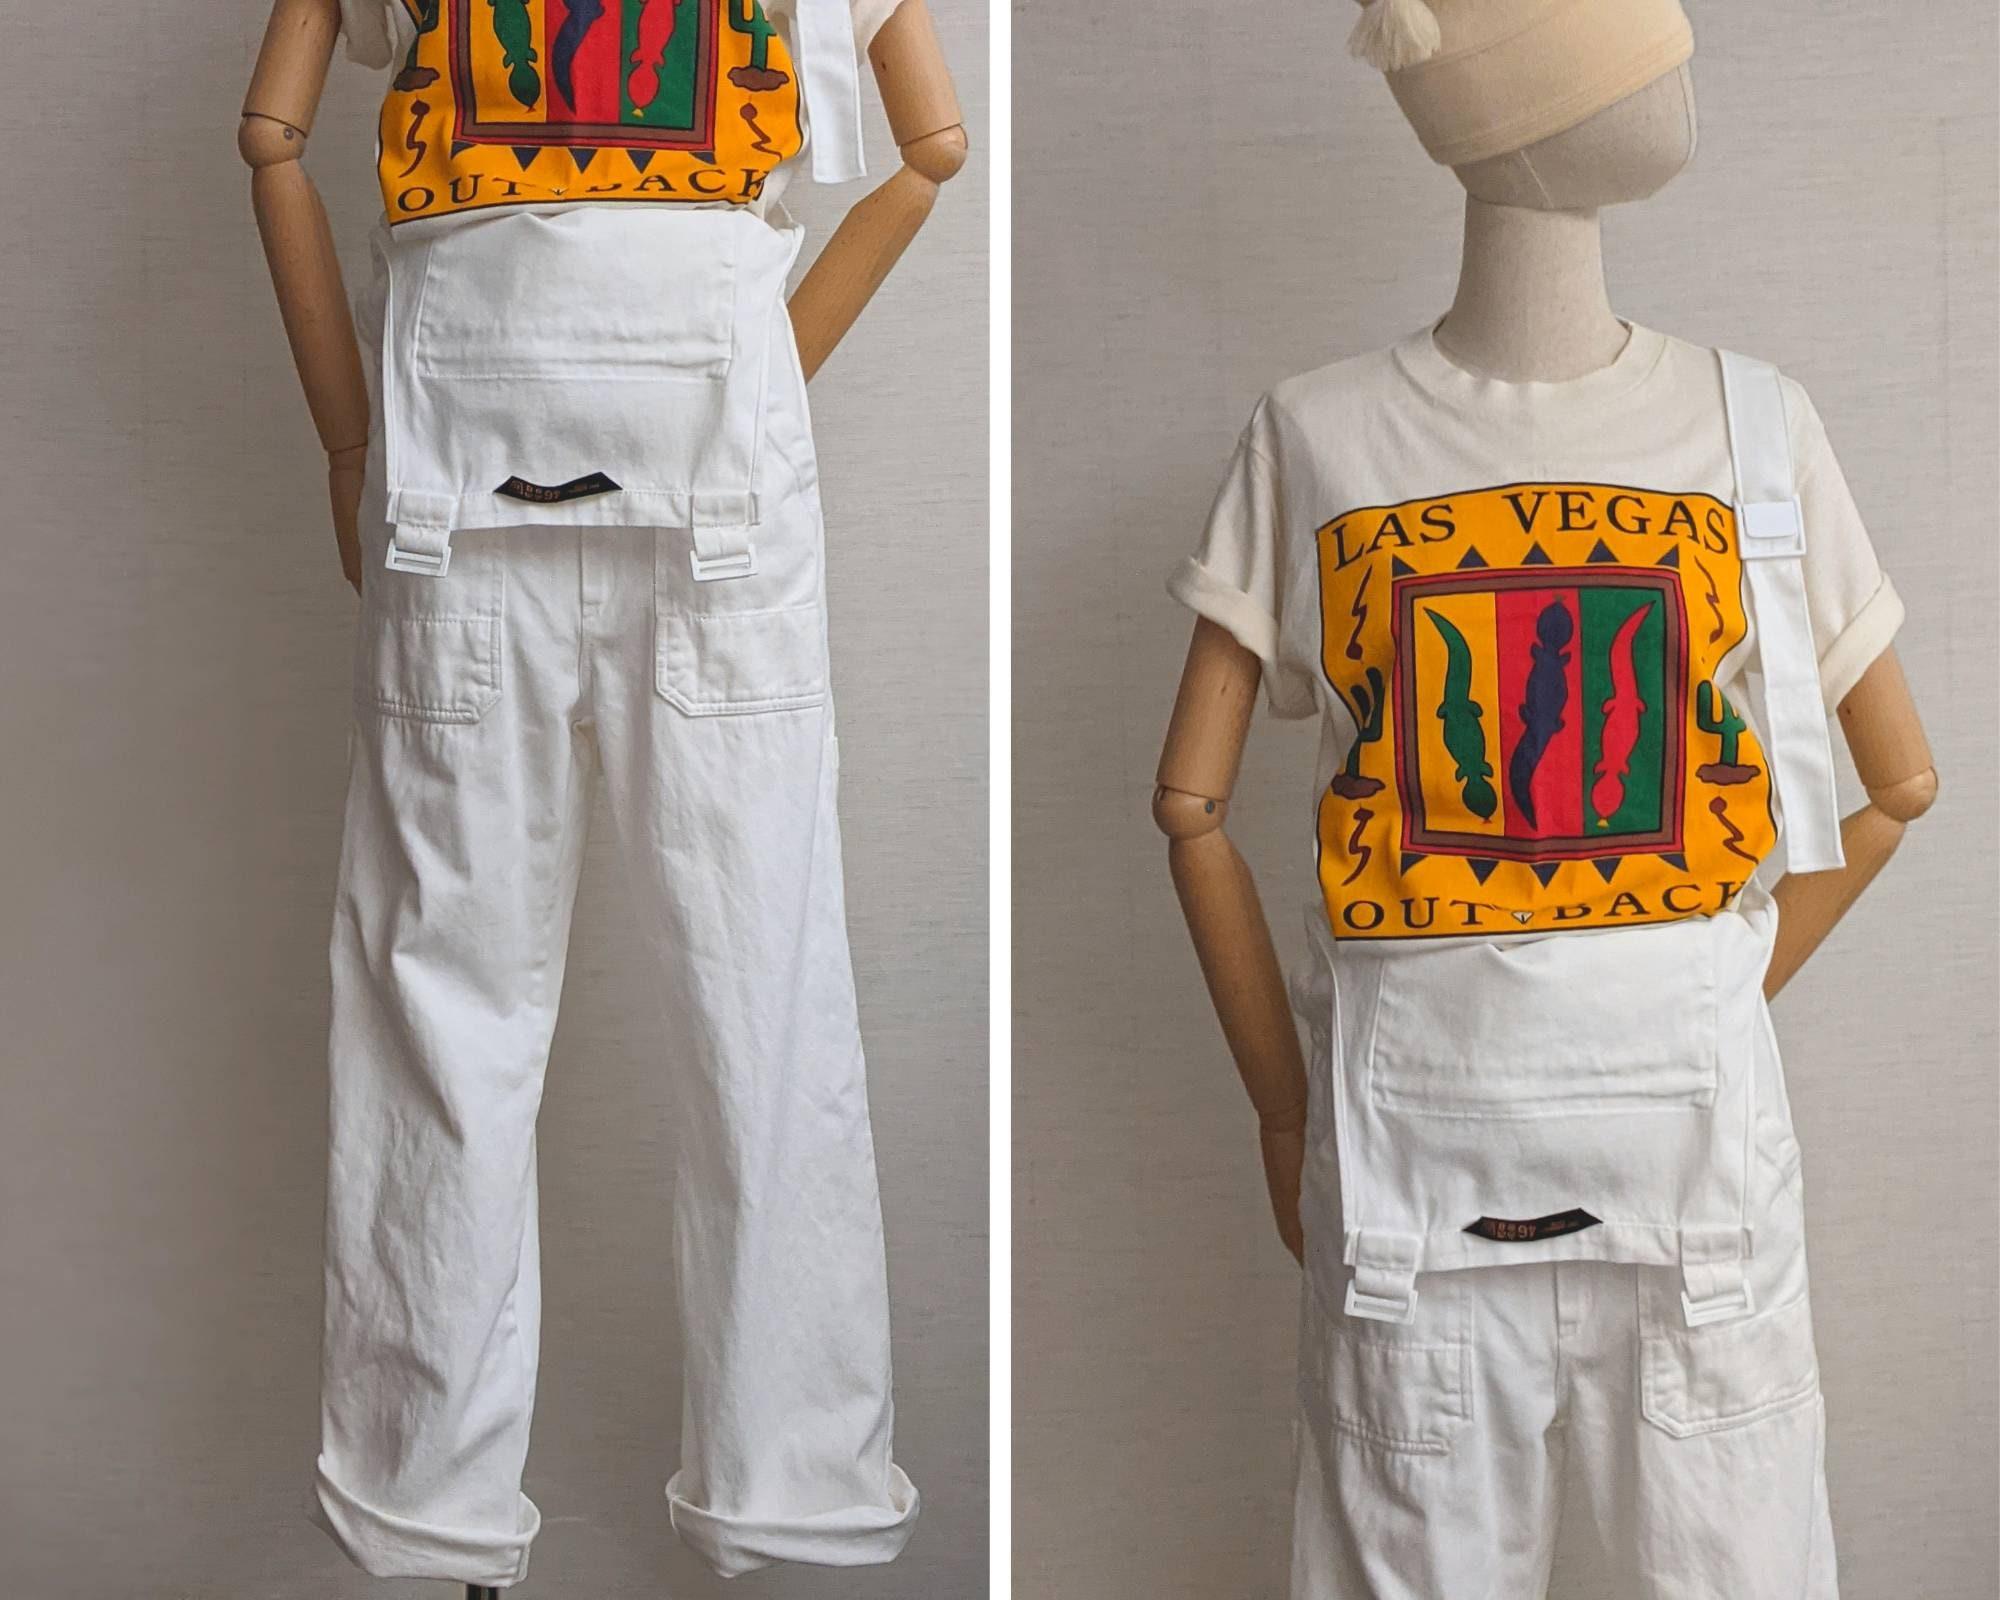 Vintage Overalls & Jumpsuits Painter Overalls Denim Work Clothing Blanco, Carpenter Style Overall Pants $29.19 AT vintagedancer.com